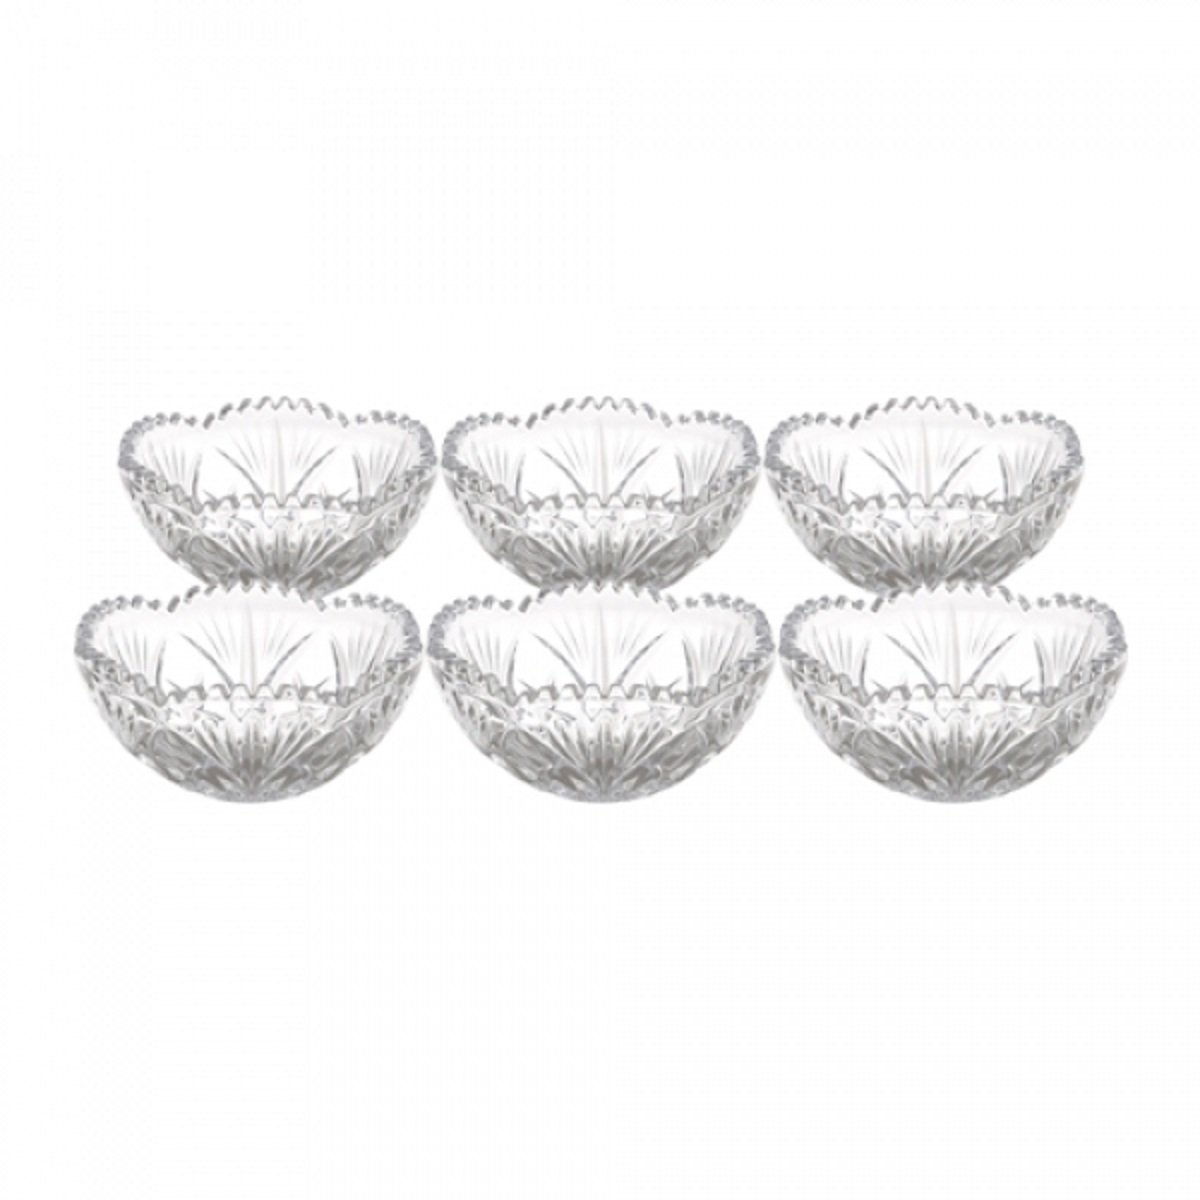 Jogo Bowls de Cristal Alberta 6 peças